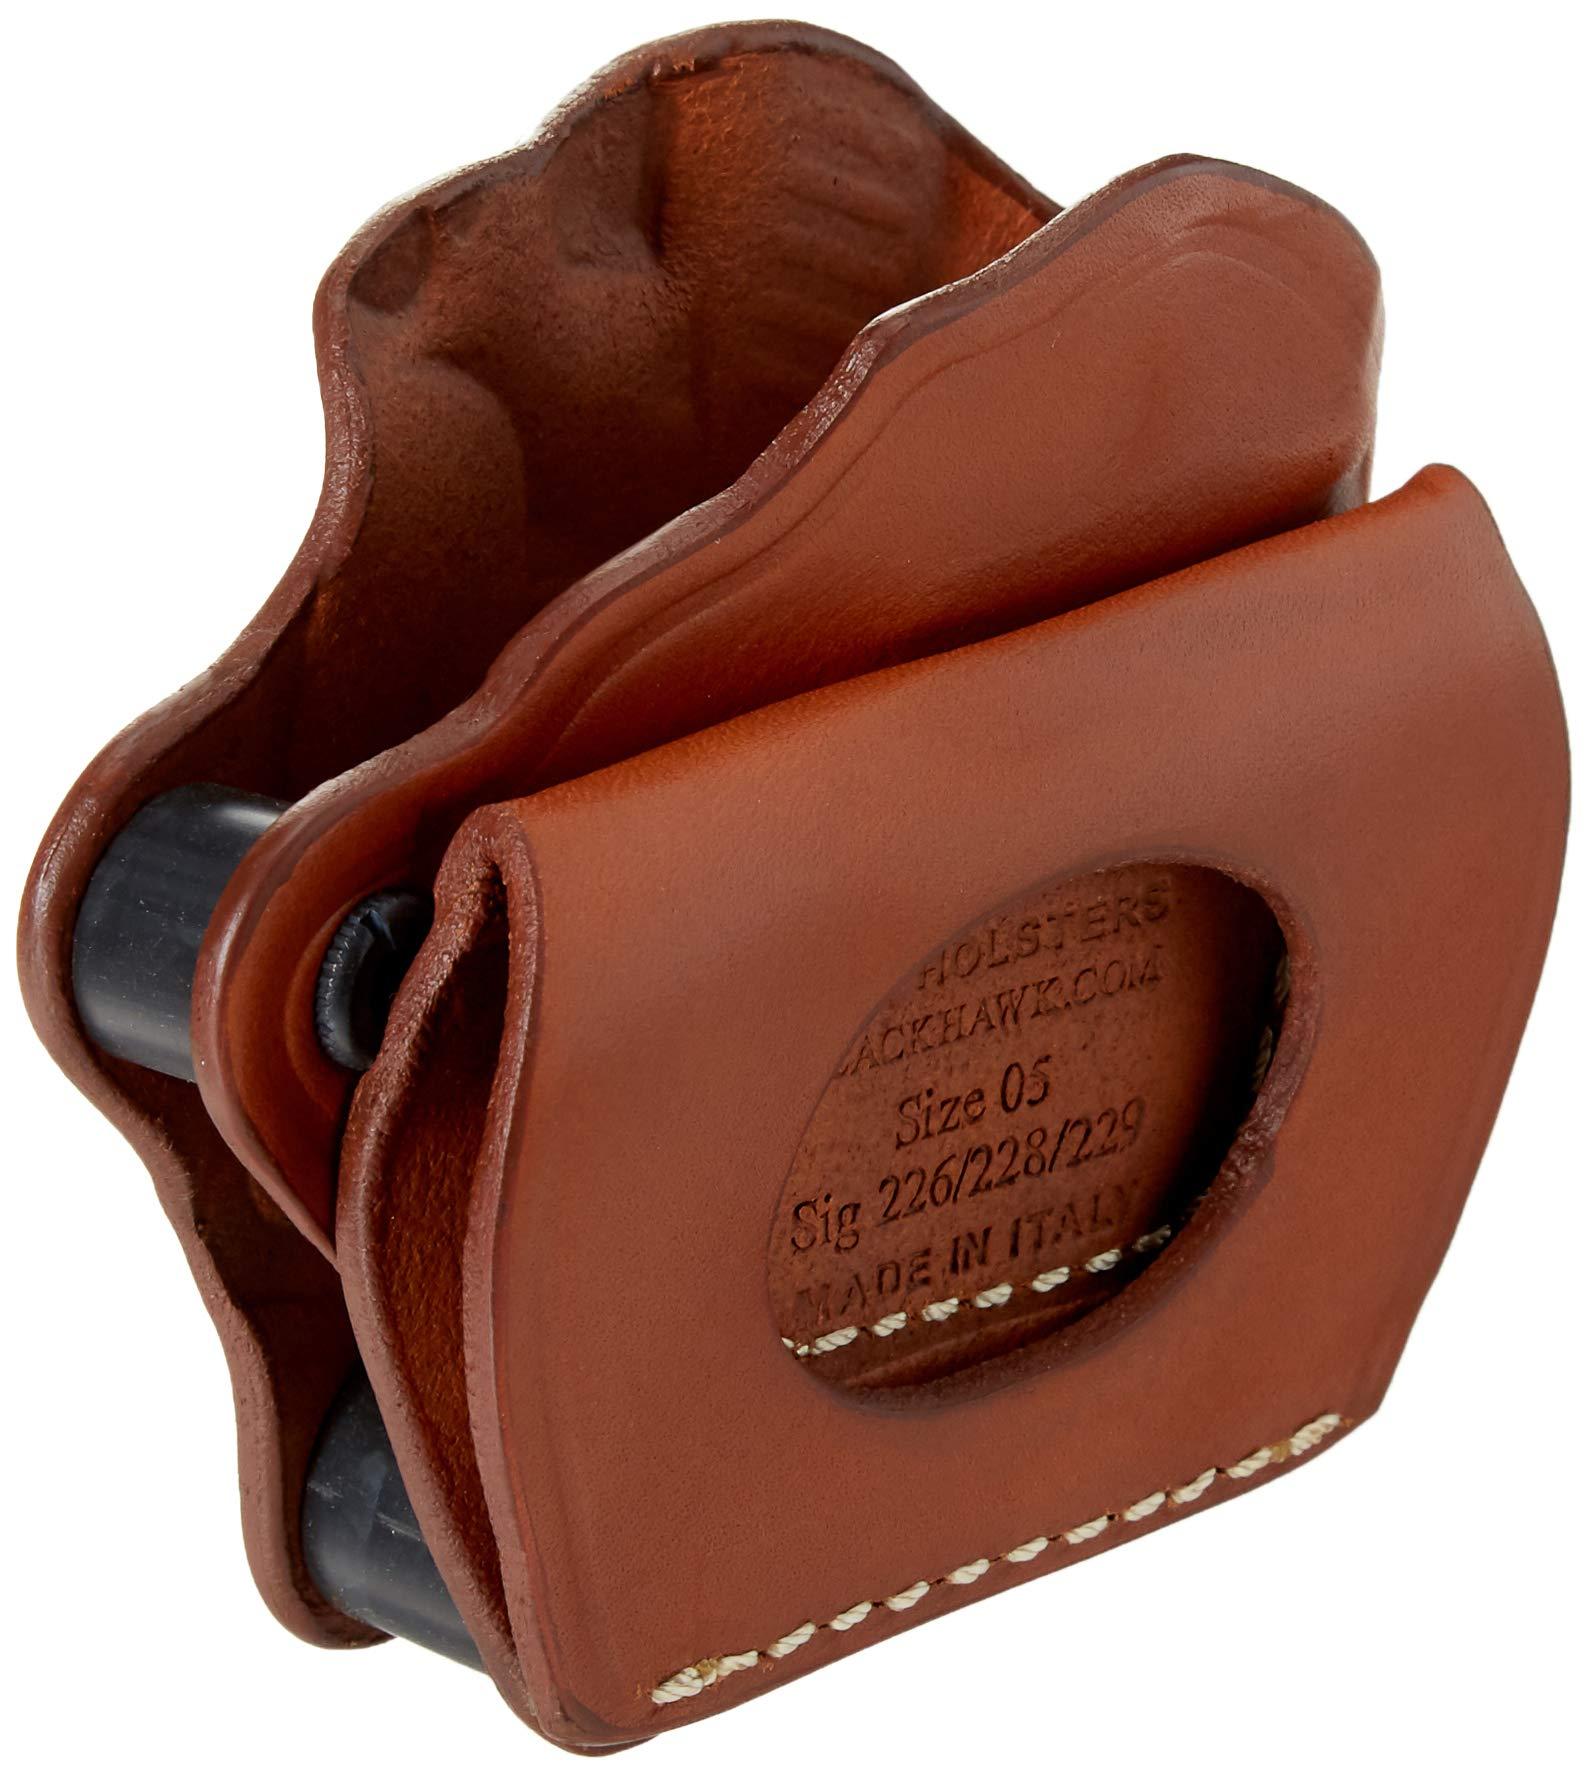 BLACKHAWK Leather Yaqui Slide Holster